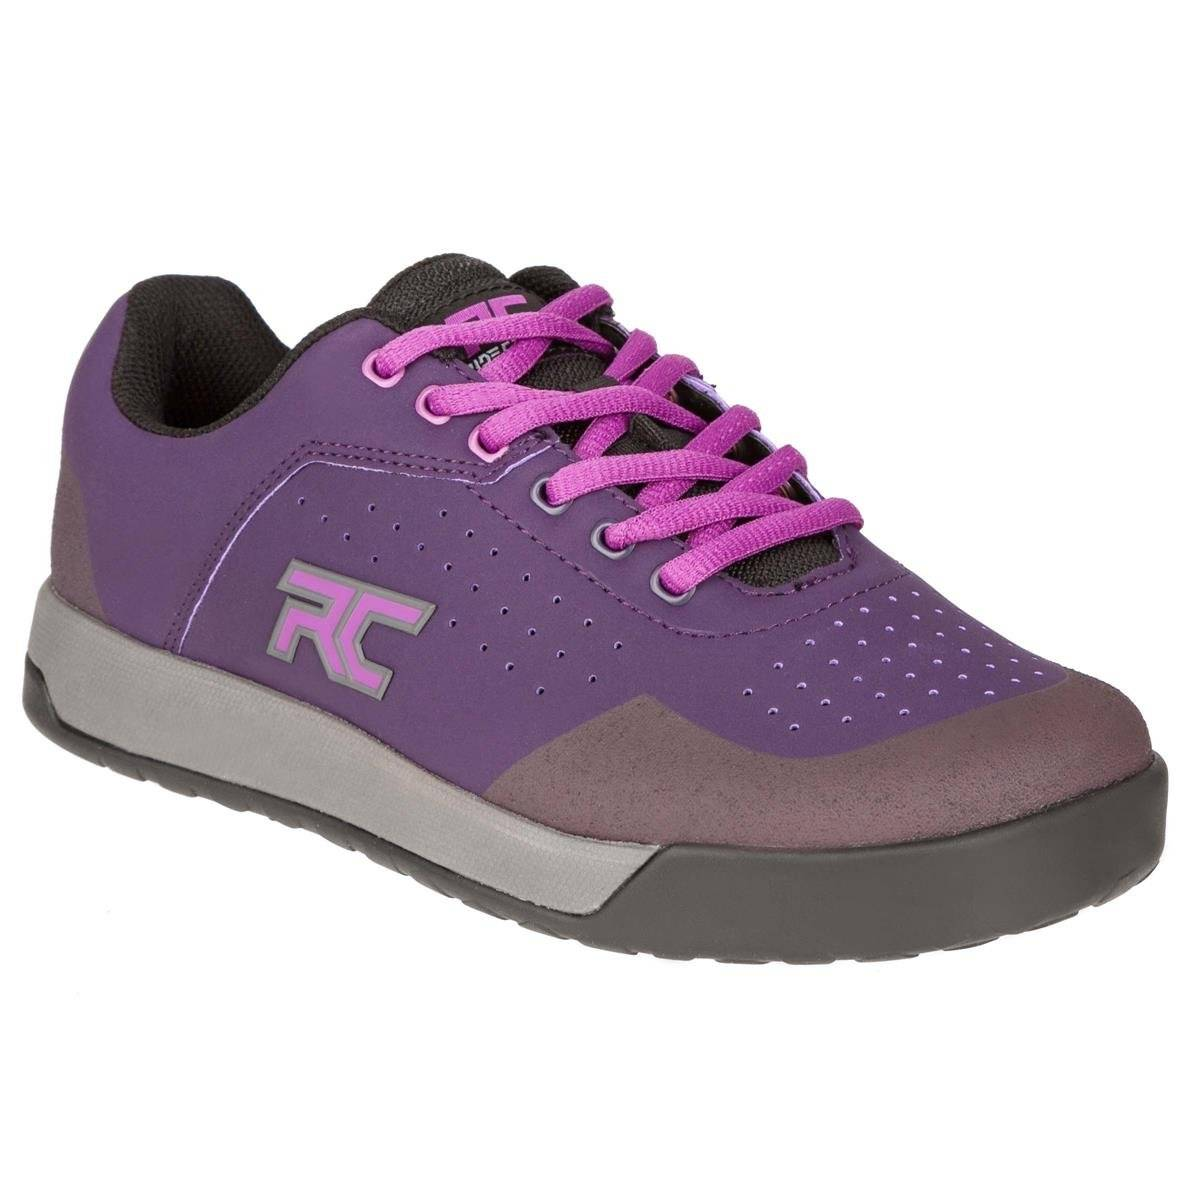 ride concepts donna scarpe mtb hellion